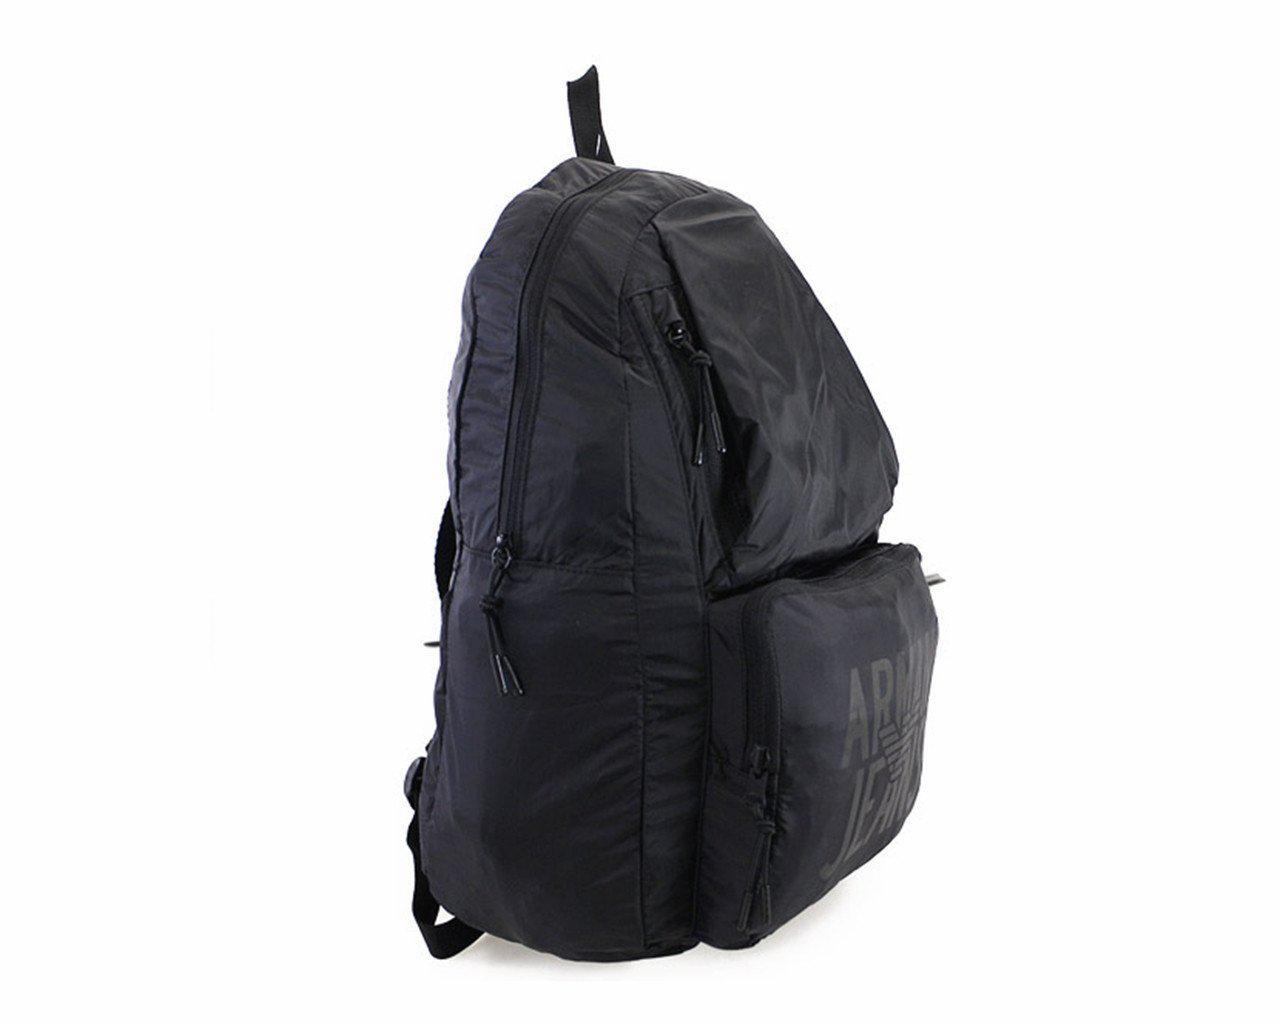 c052a2dcb2 Armani Jeans Zaino Backpack Black Bag in Black for Men - Lyst